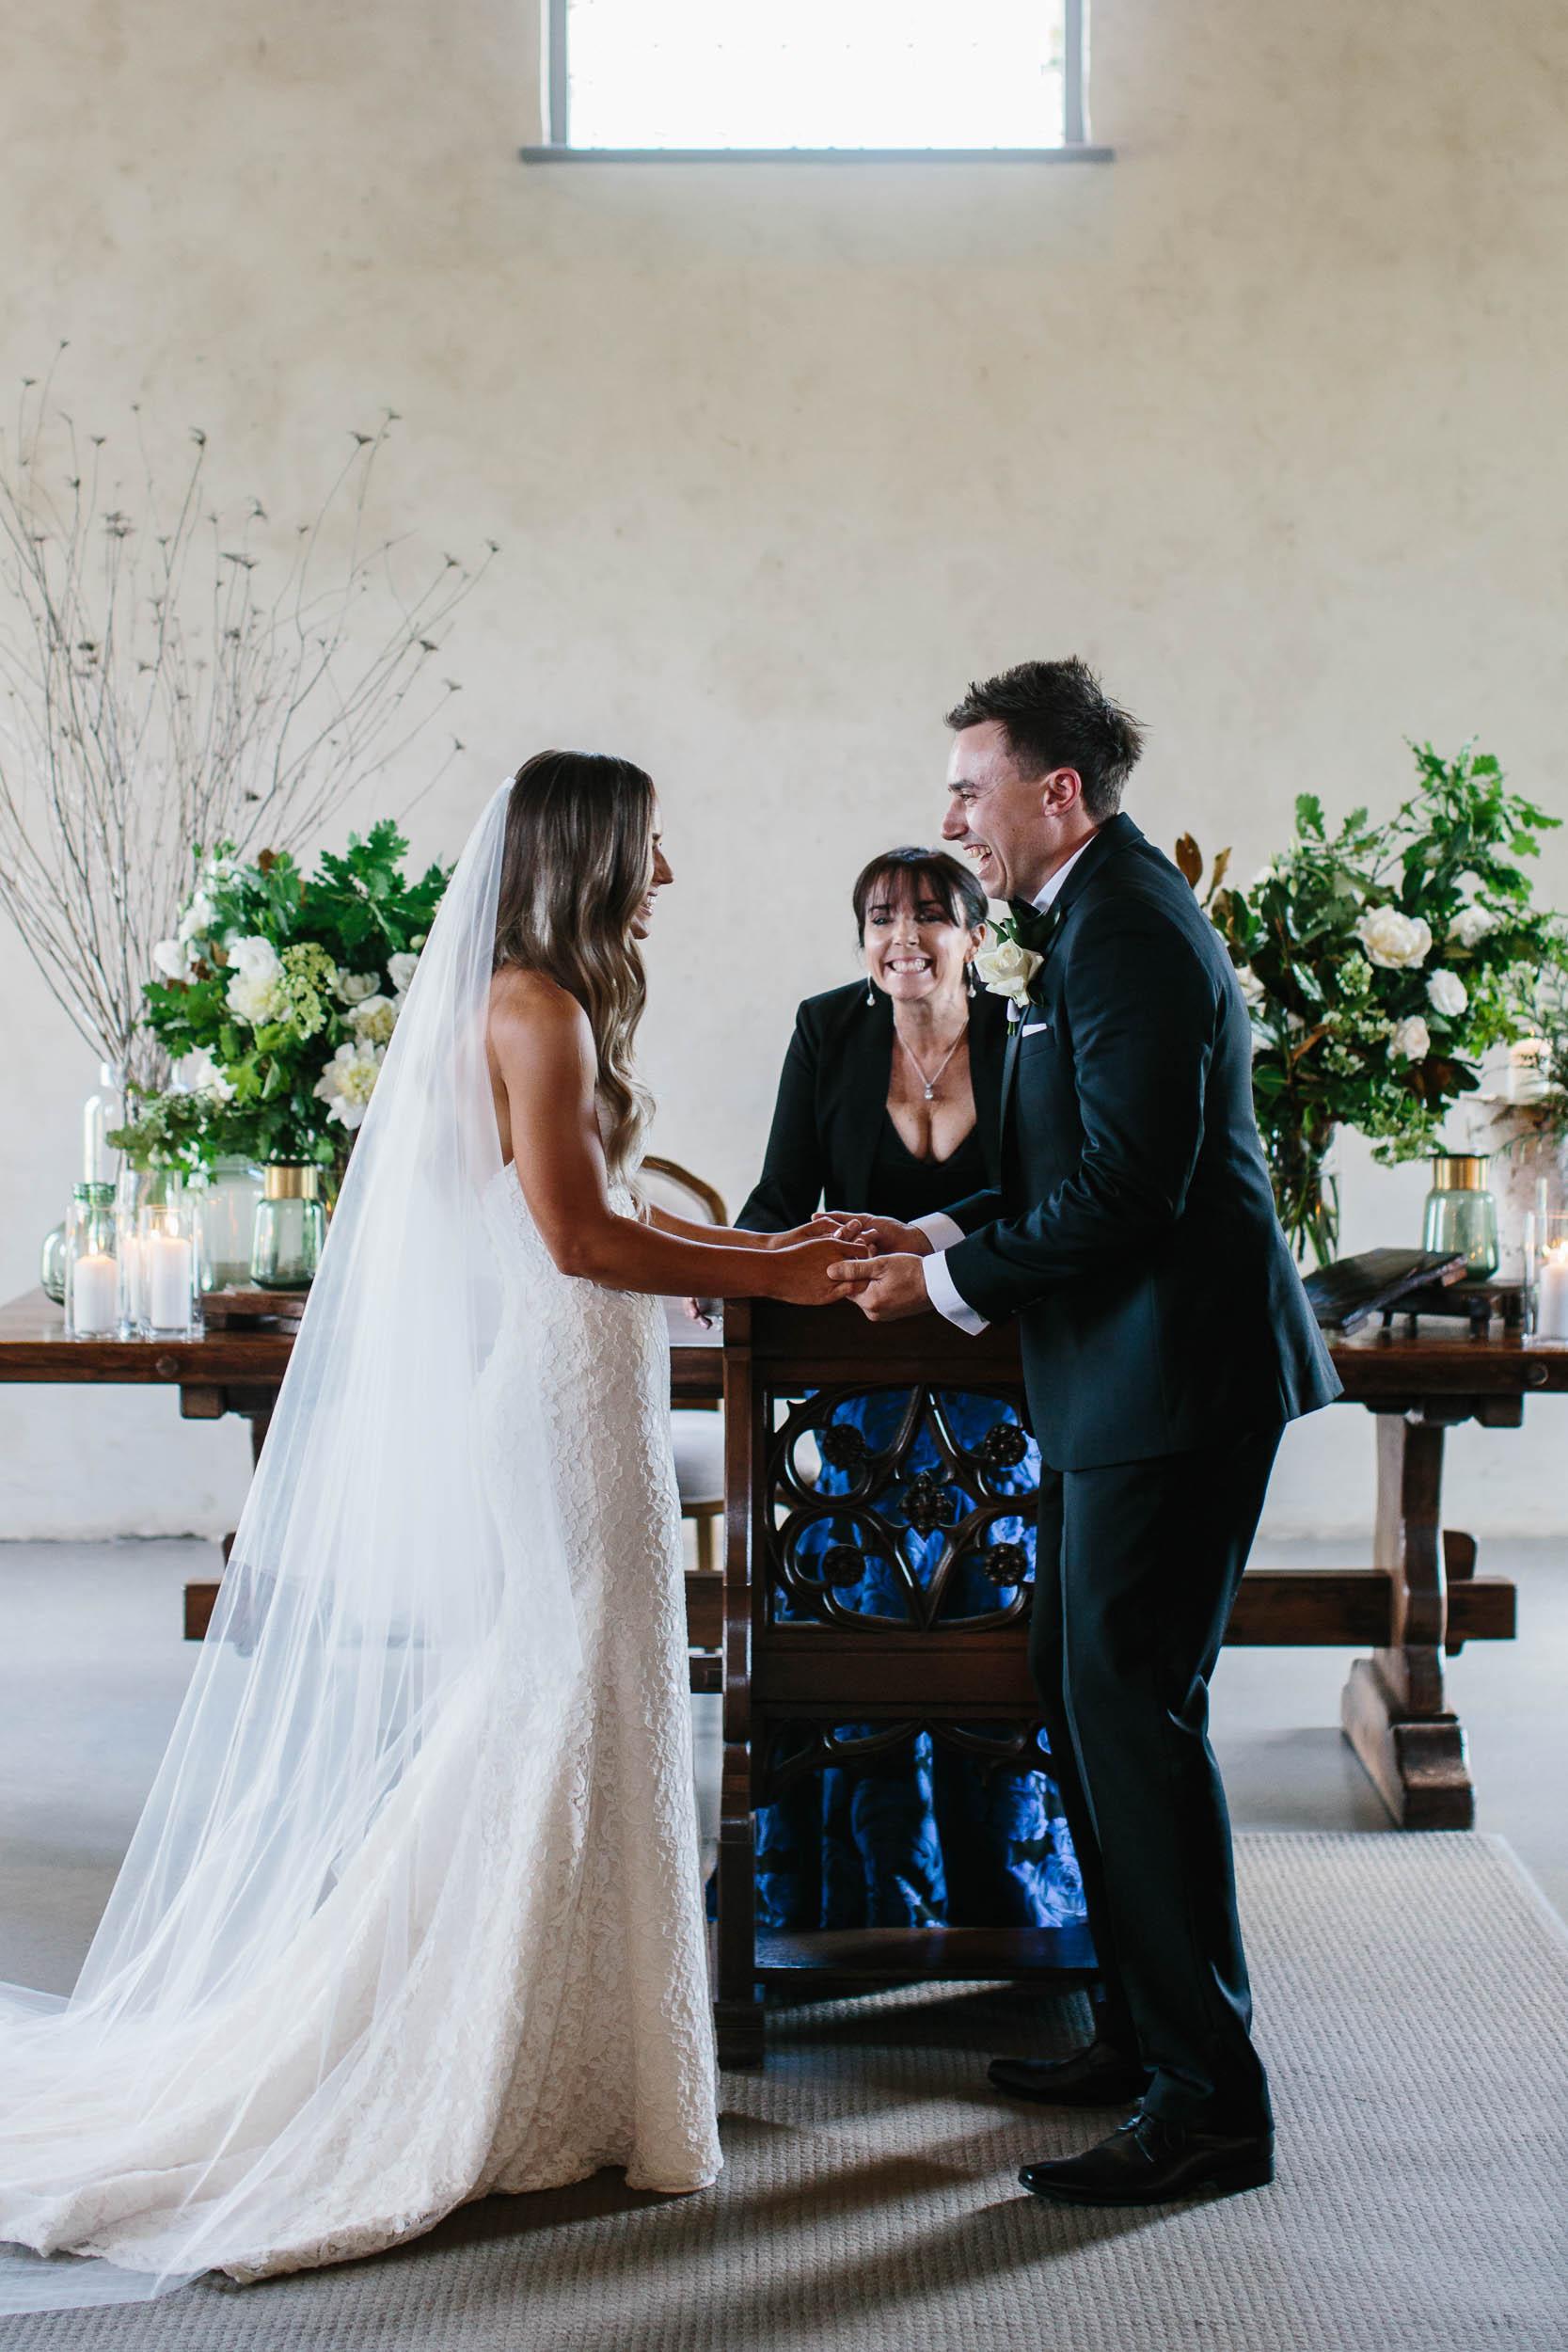 Kas-Richards-Stones-of-the-Yarra-Valley-Wedding-374.jpg